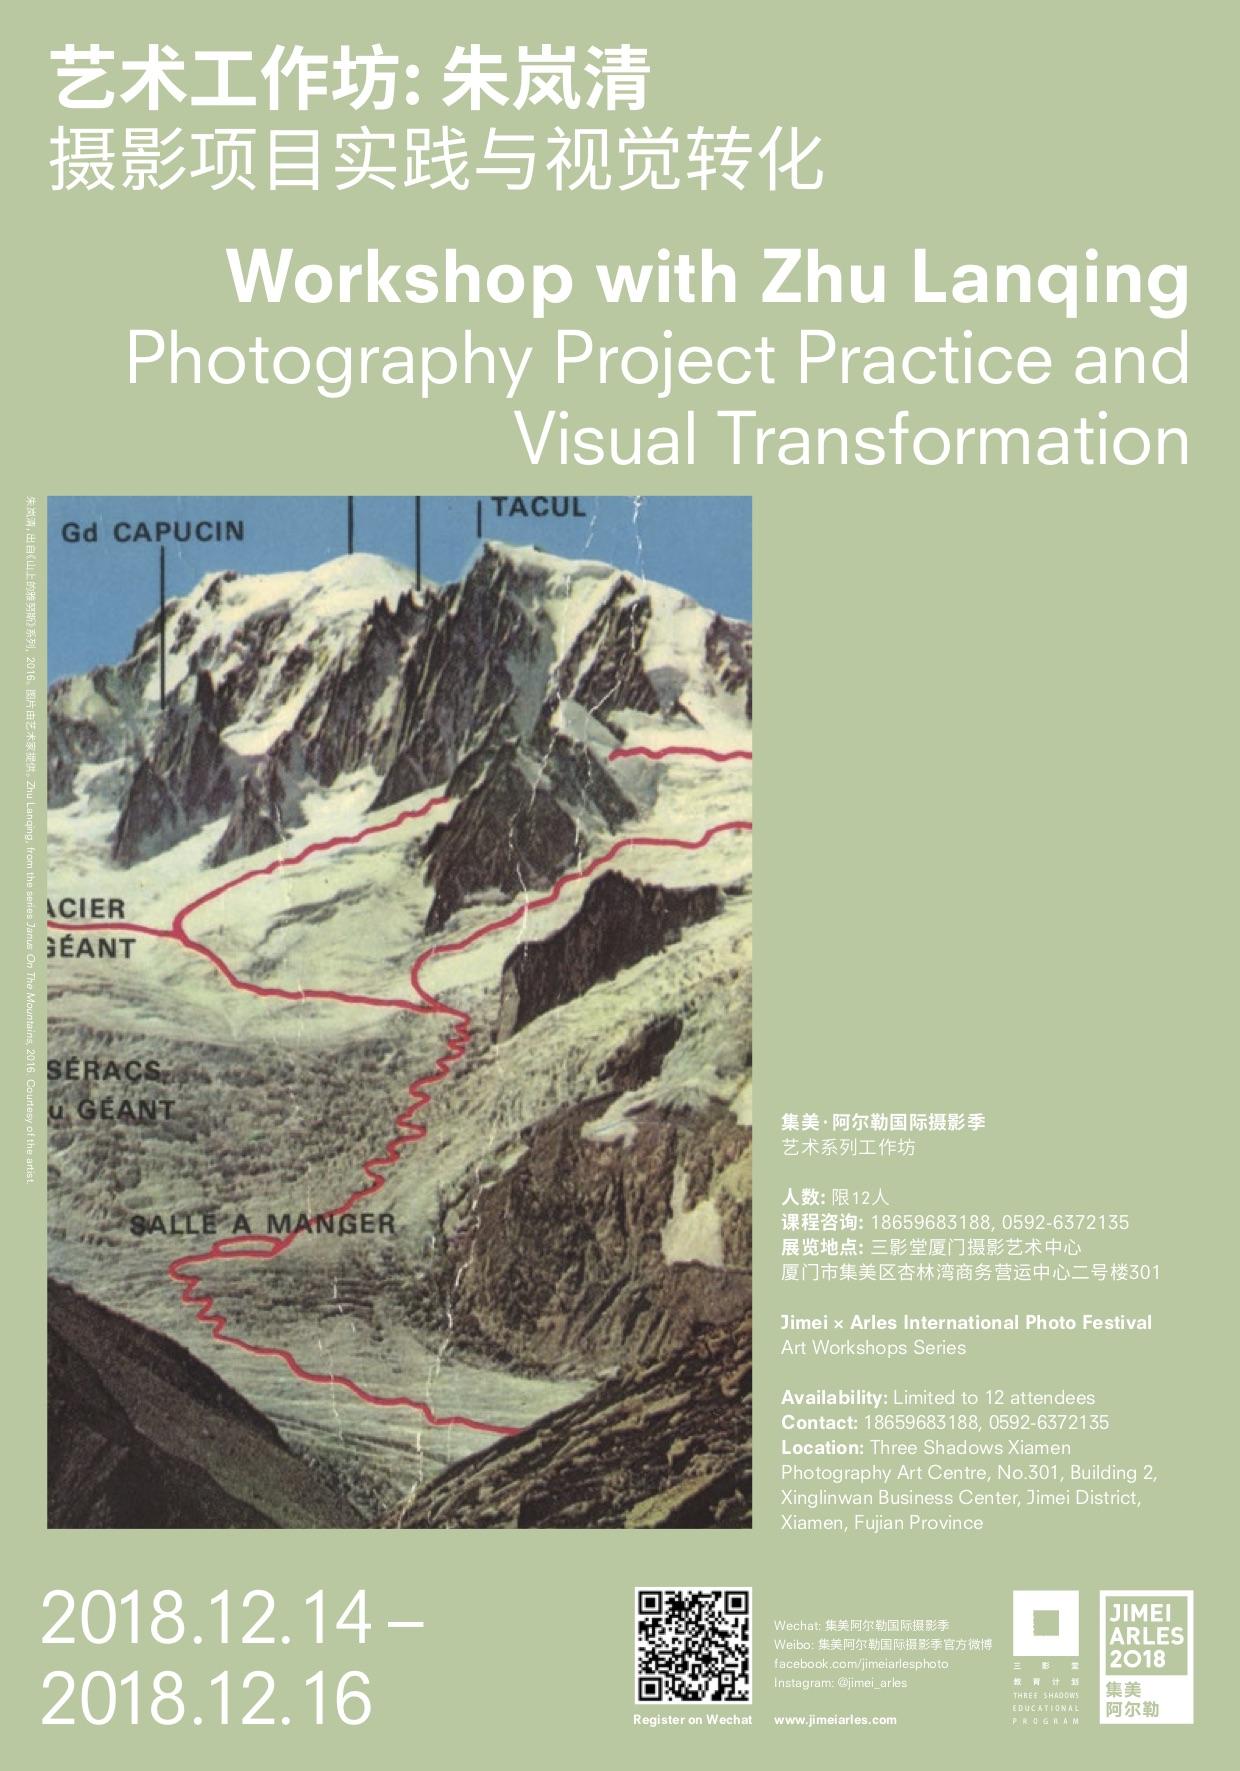 JIMEIARLES_Workshop Poster_Digital_Zhu_Lanqing.jpg